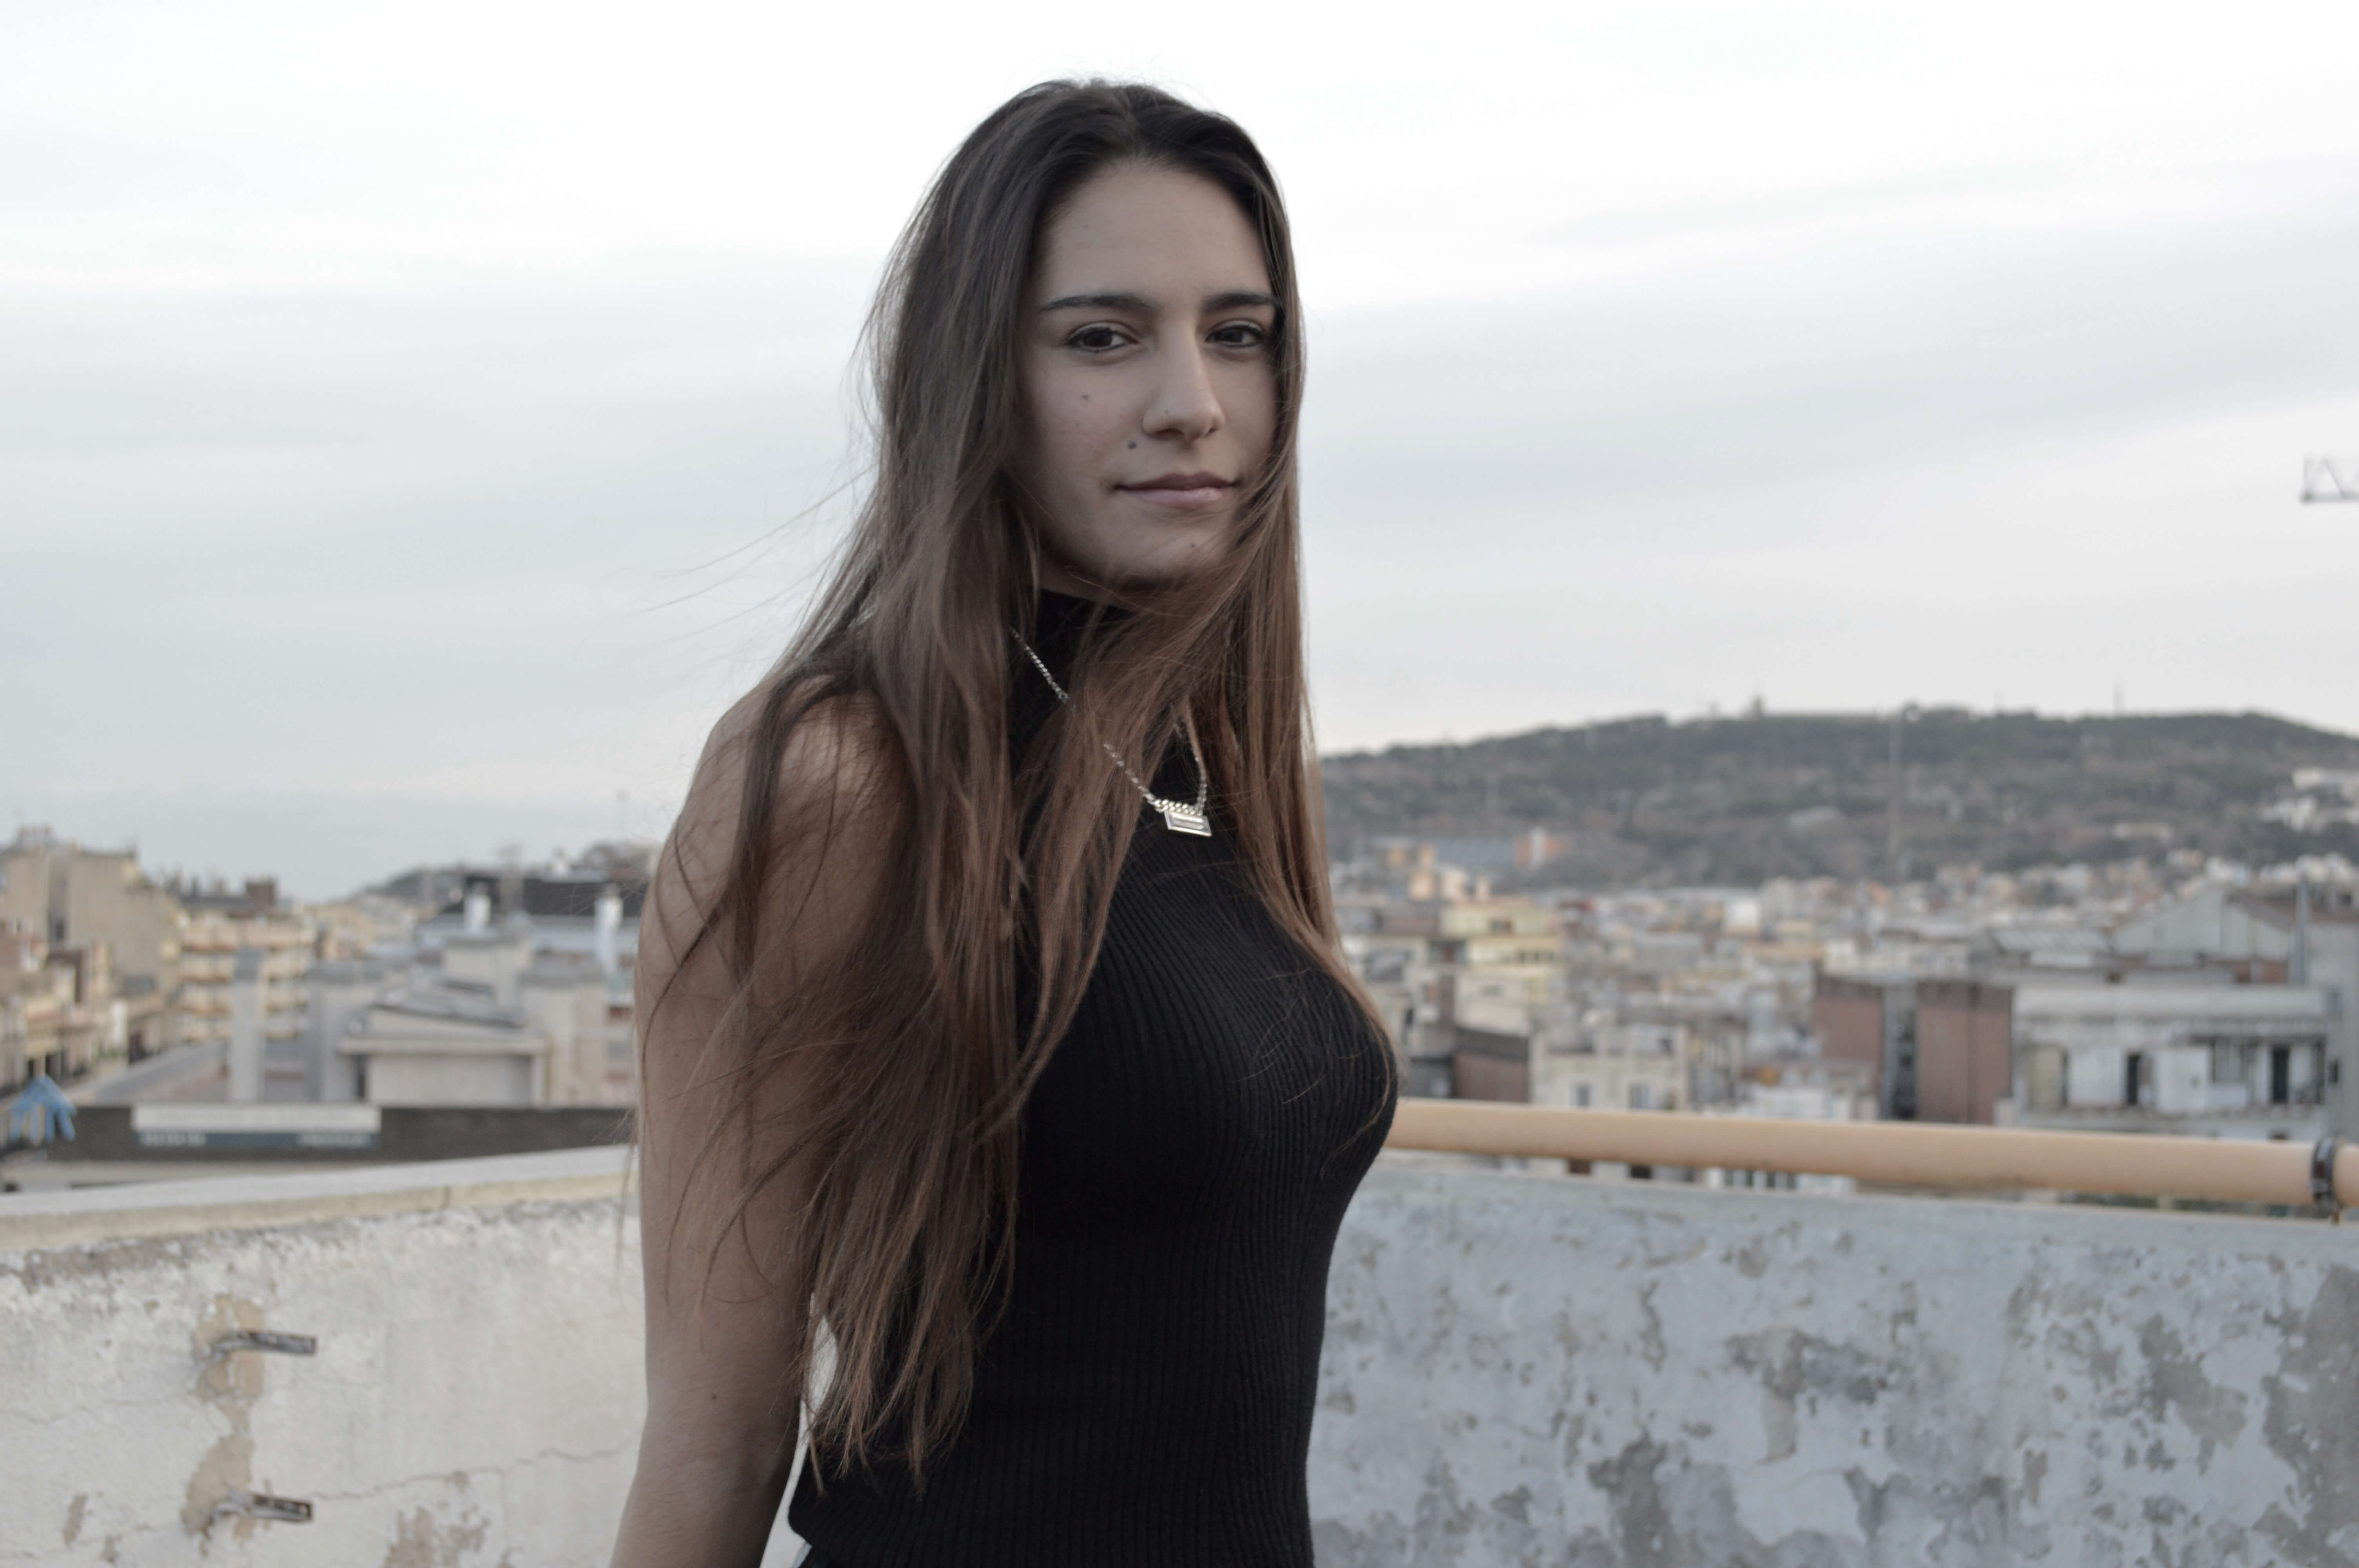 Go to Maragda Farràs's profile